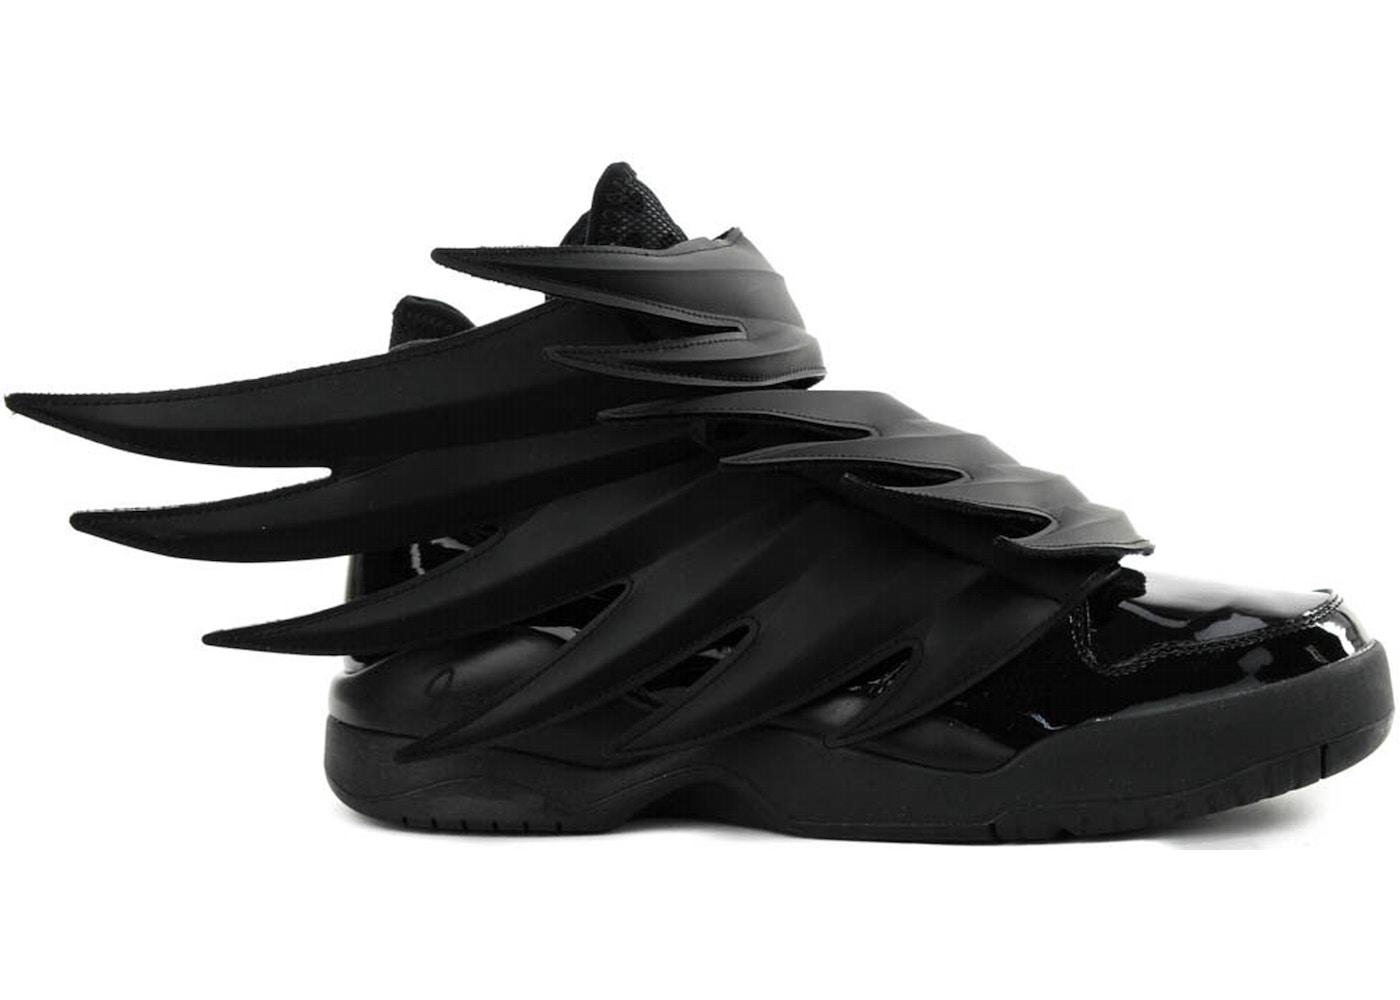 262575fee568 HypeAnalyzer · adidas Jeremy Scott Wings 3.0 Dark Knight